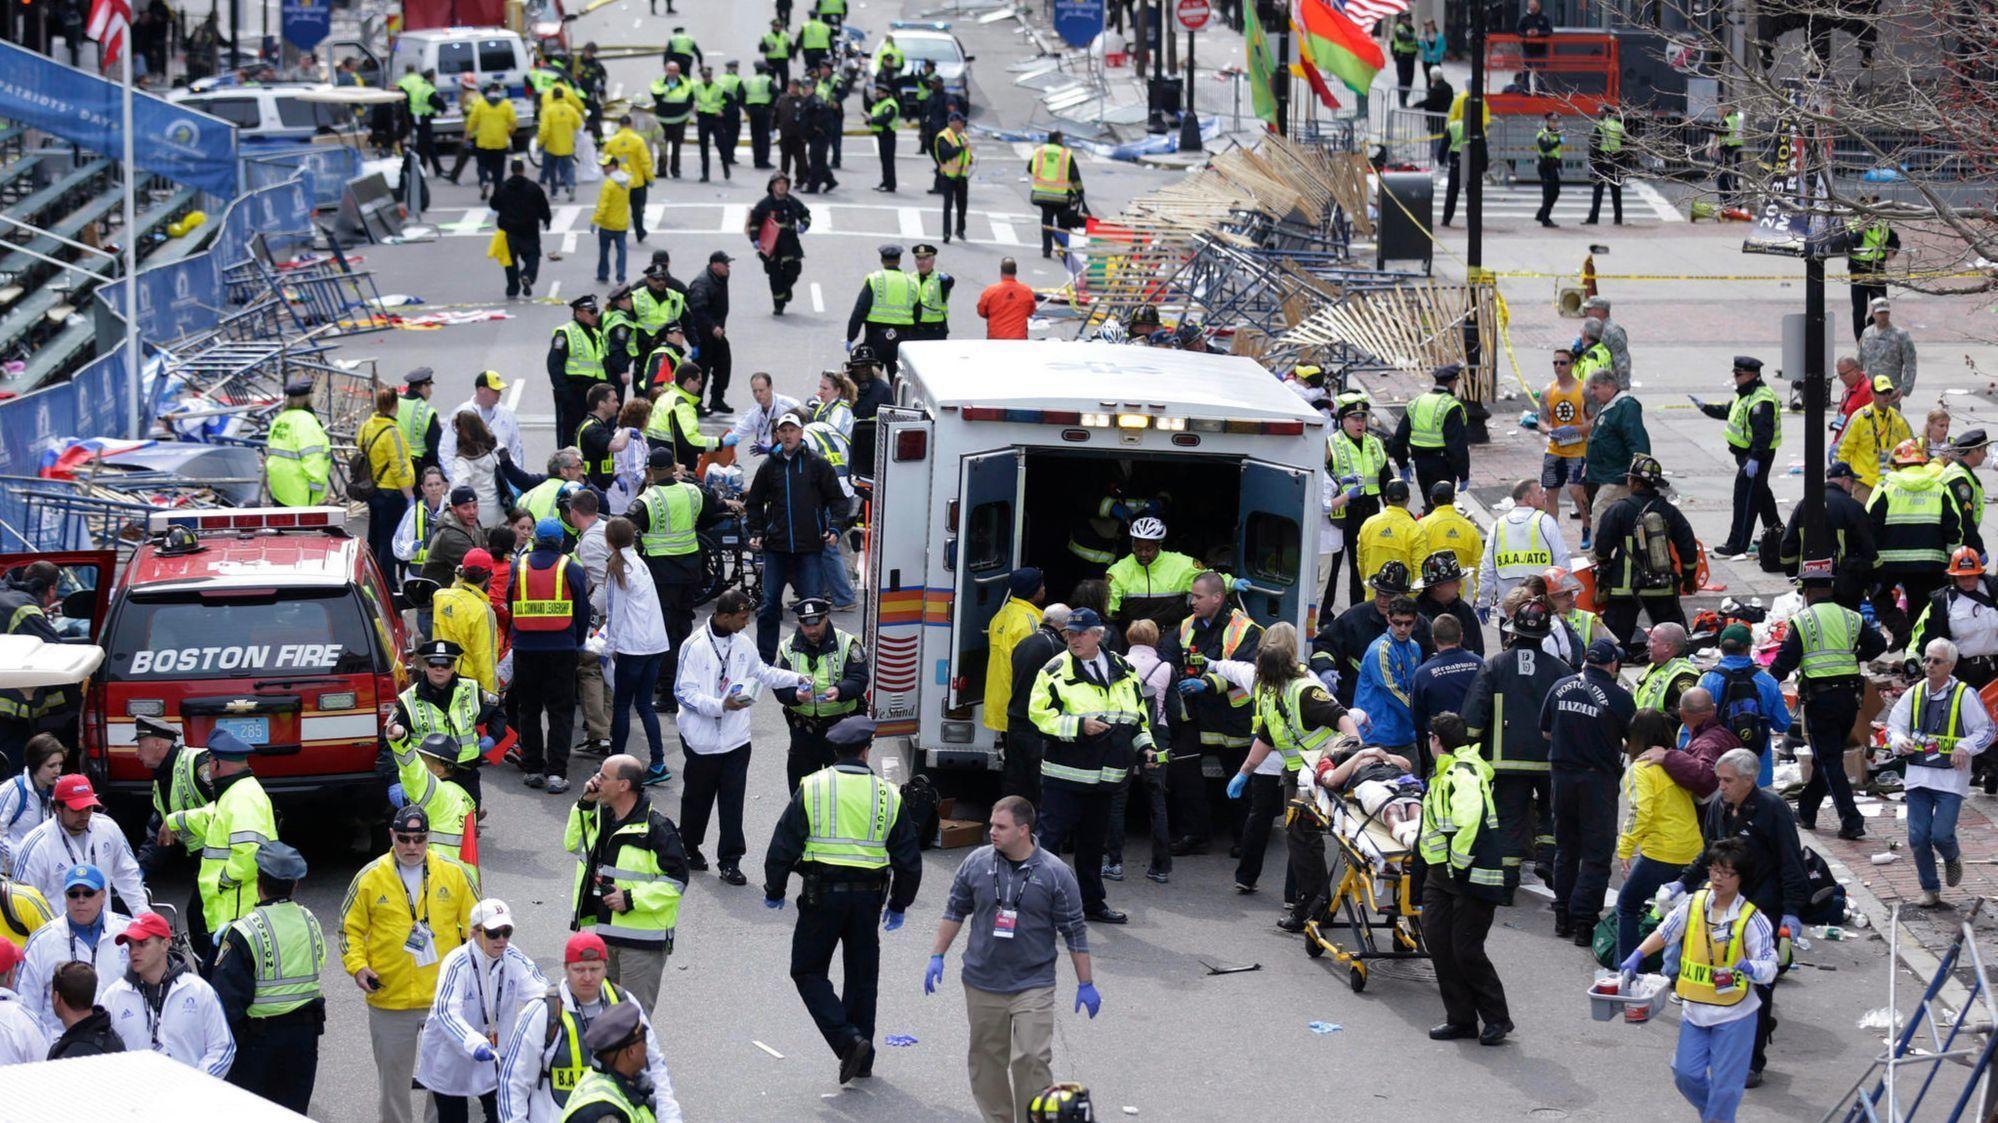 Key Moments In The 2013 Boston Marathon Bombing